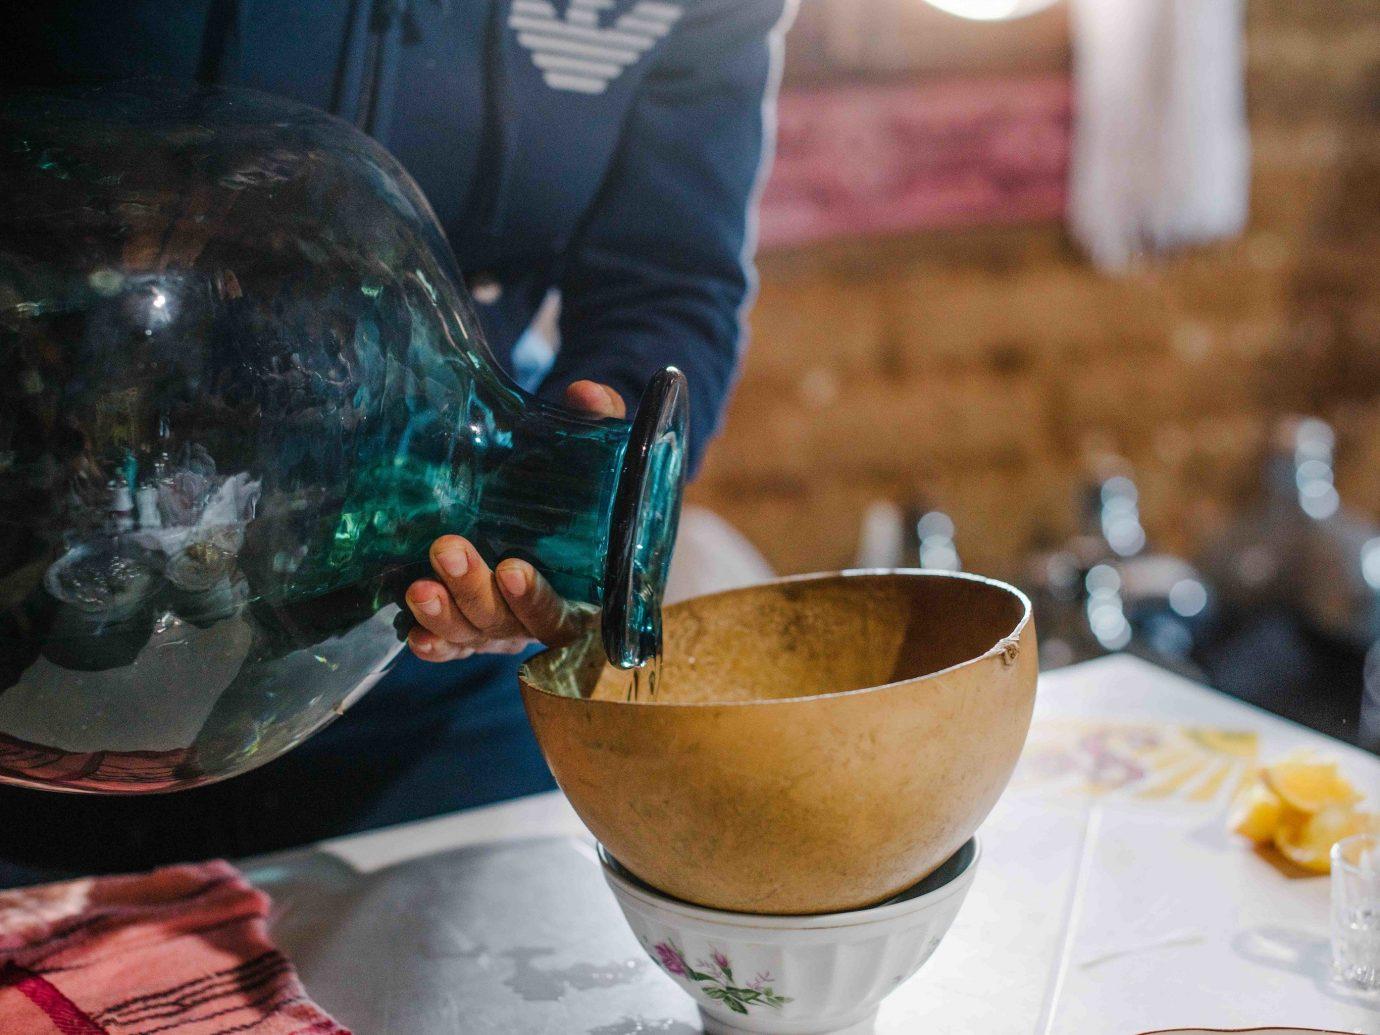 Arts + Culture Mexico Oaxaca Trip Ideas table cup indoor food dish cuisine Drink